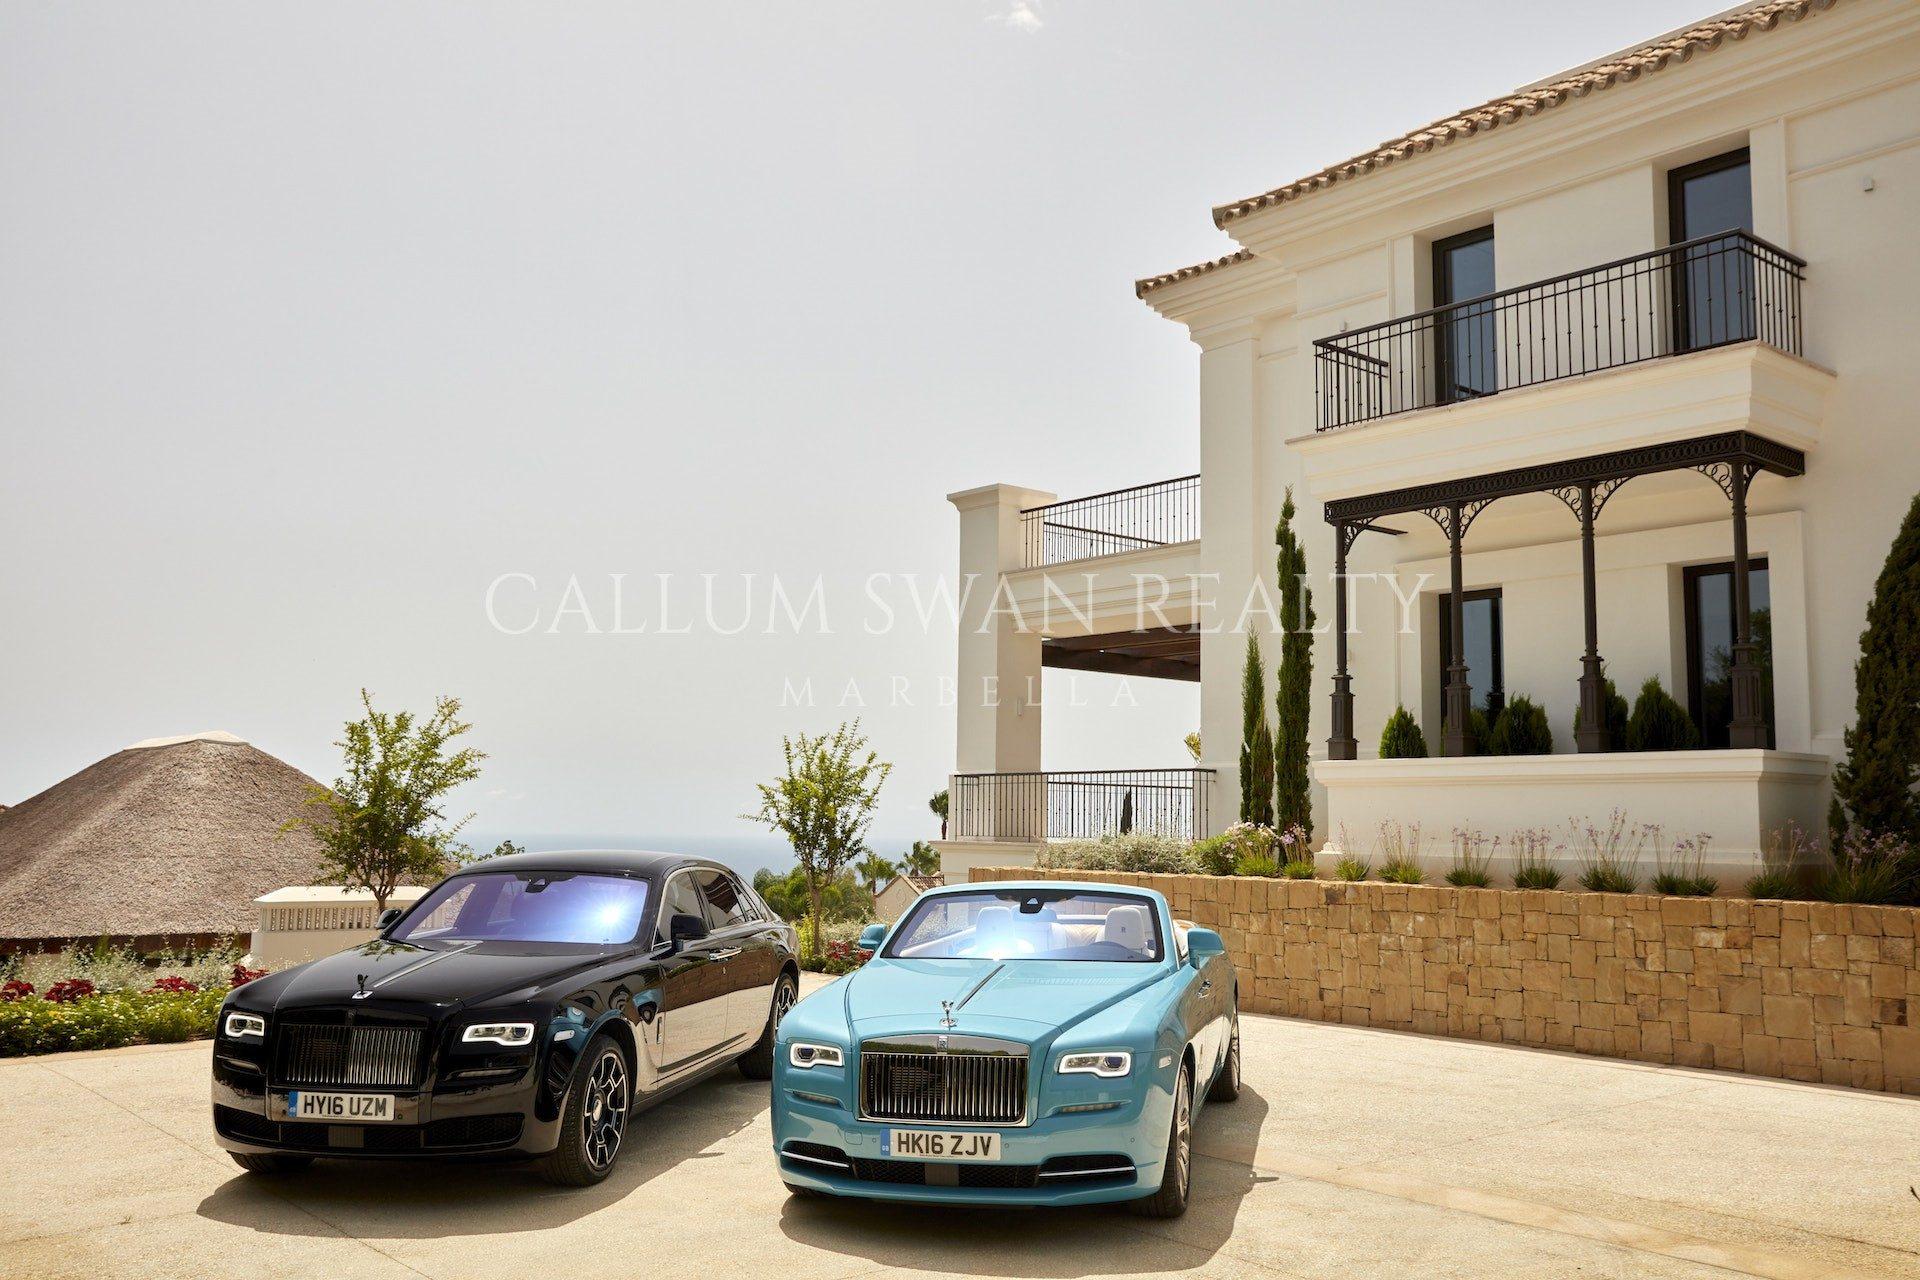 Rolls Royce Returns To Marbella With Callum Swan